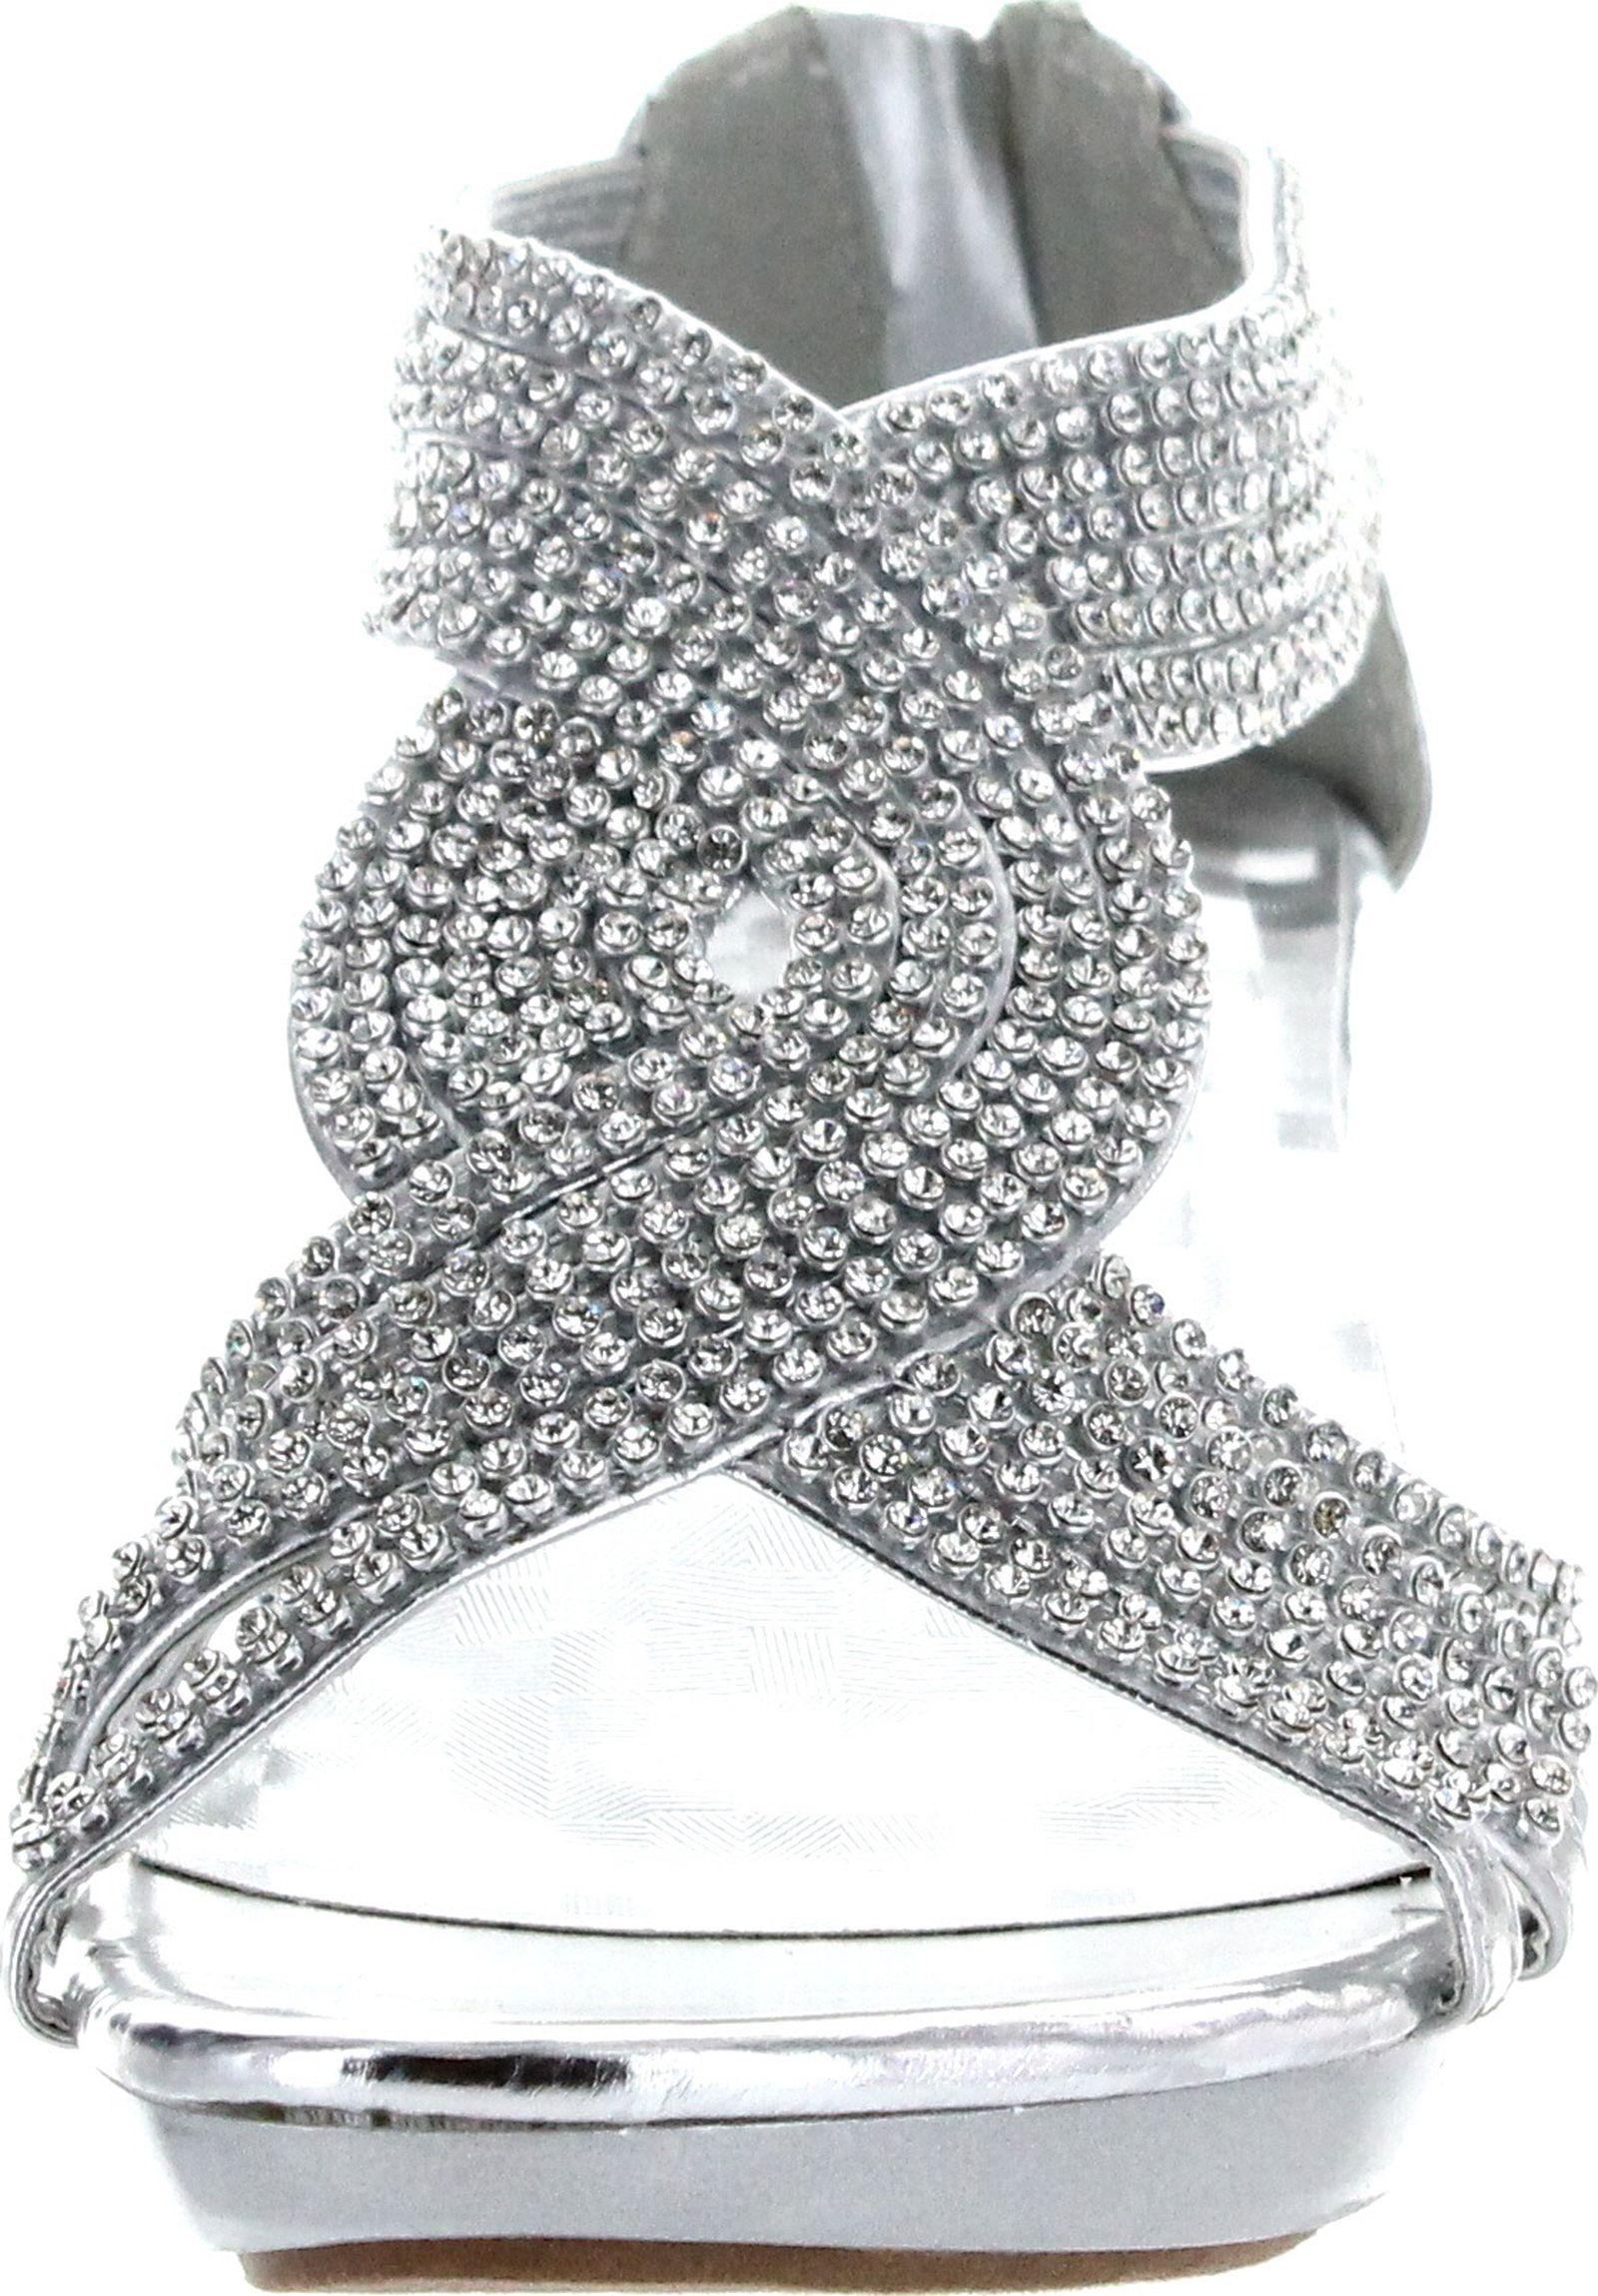 f3bff74a82dab8 Delicacy Womens Angel-37a Open Toe Med Heel Wedding Dress Sandal ...